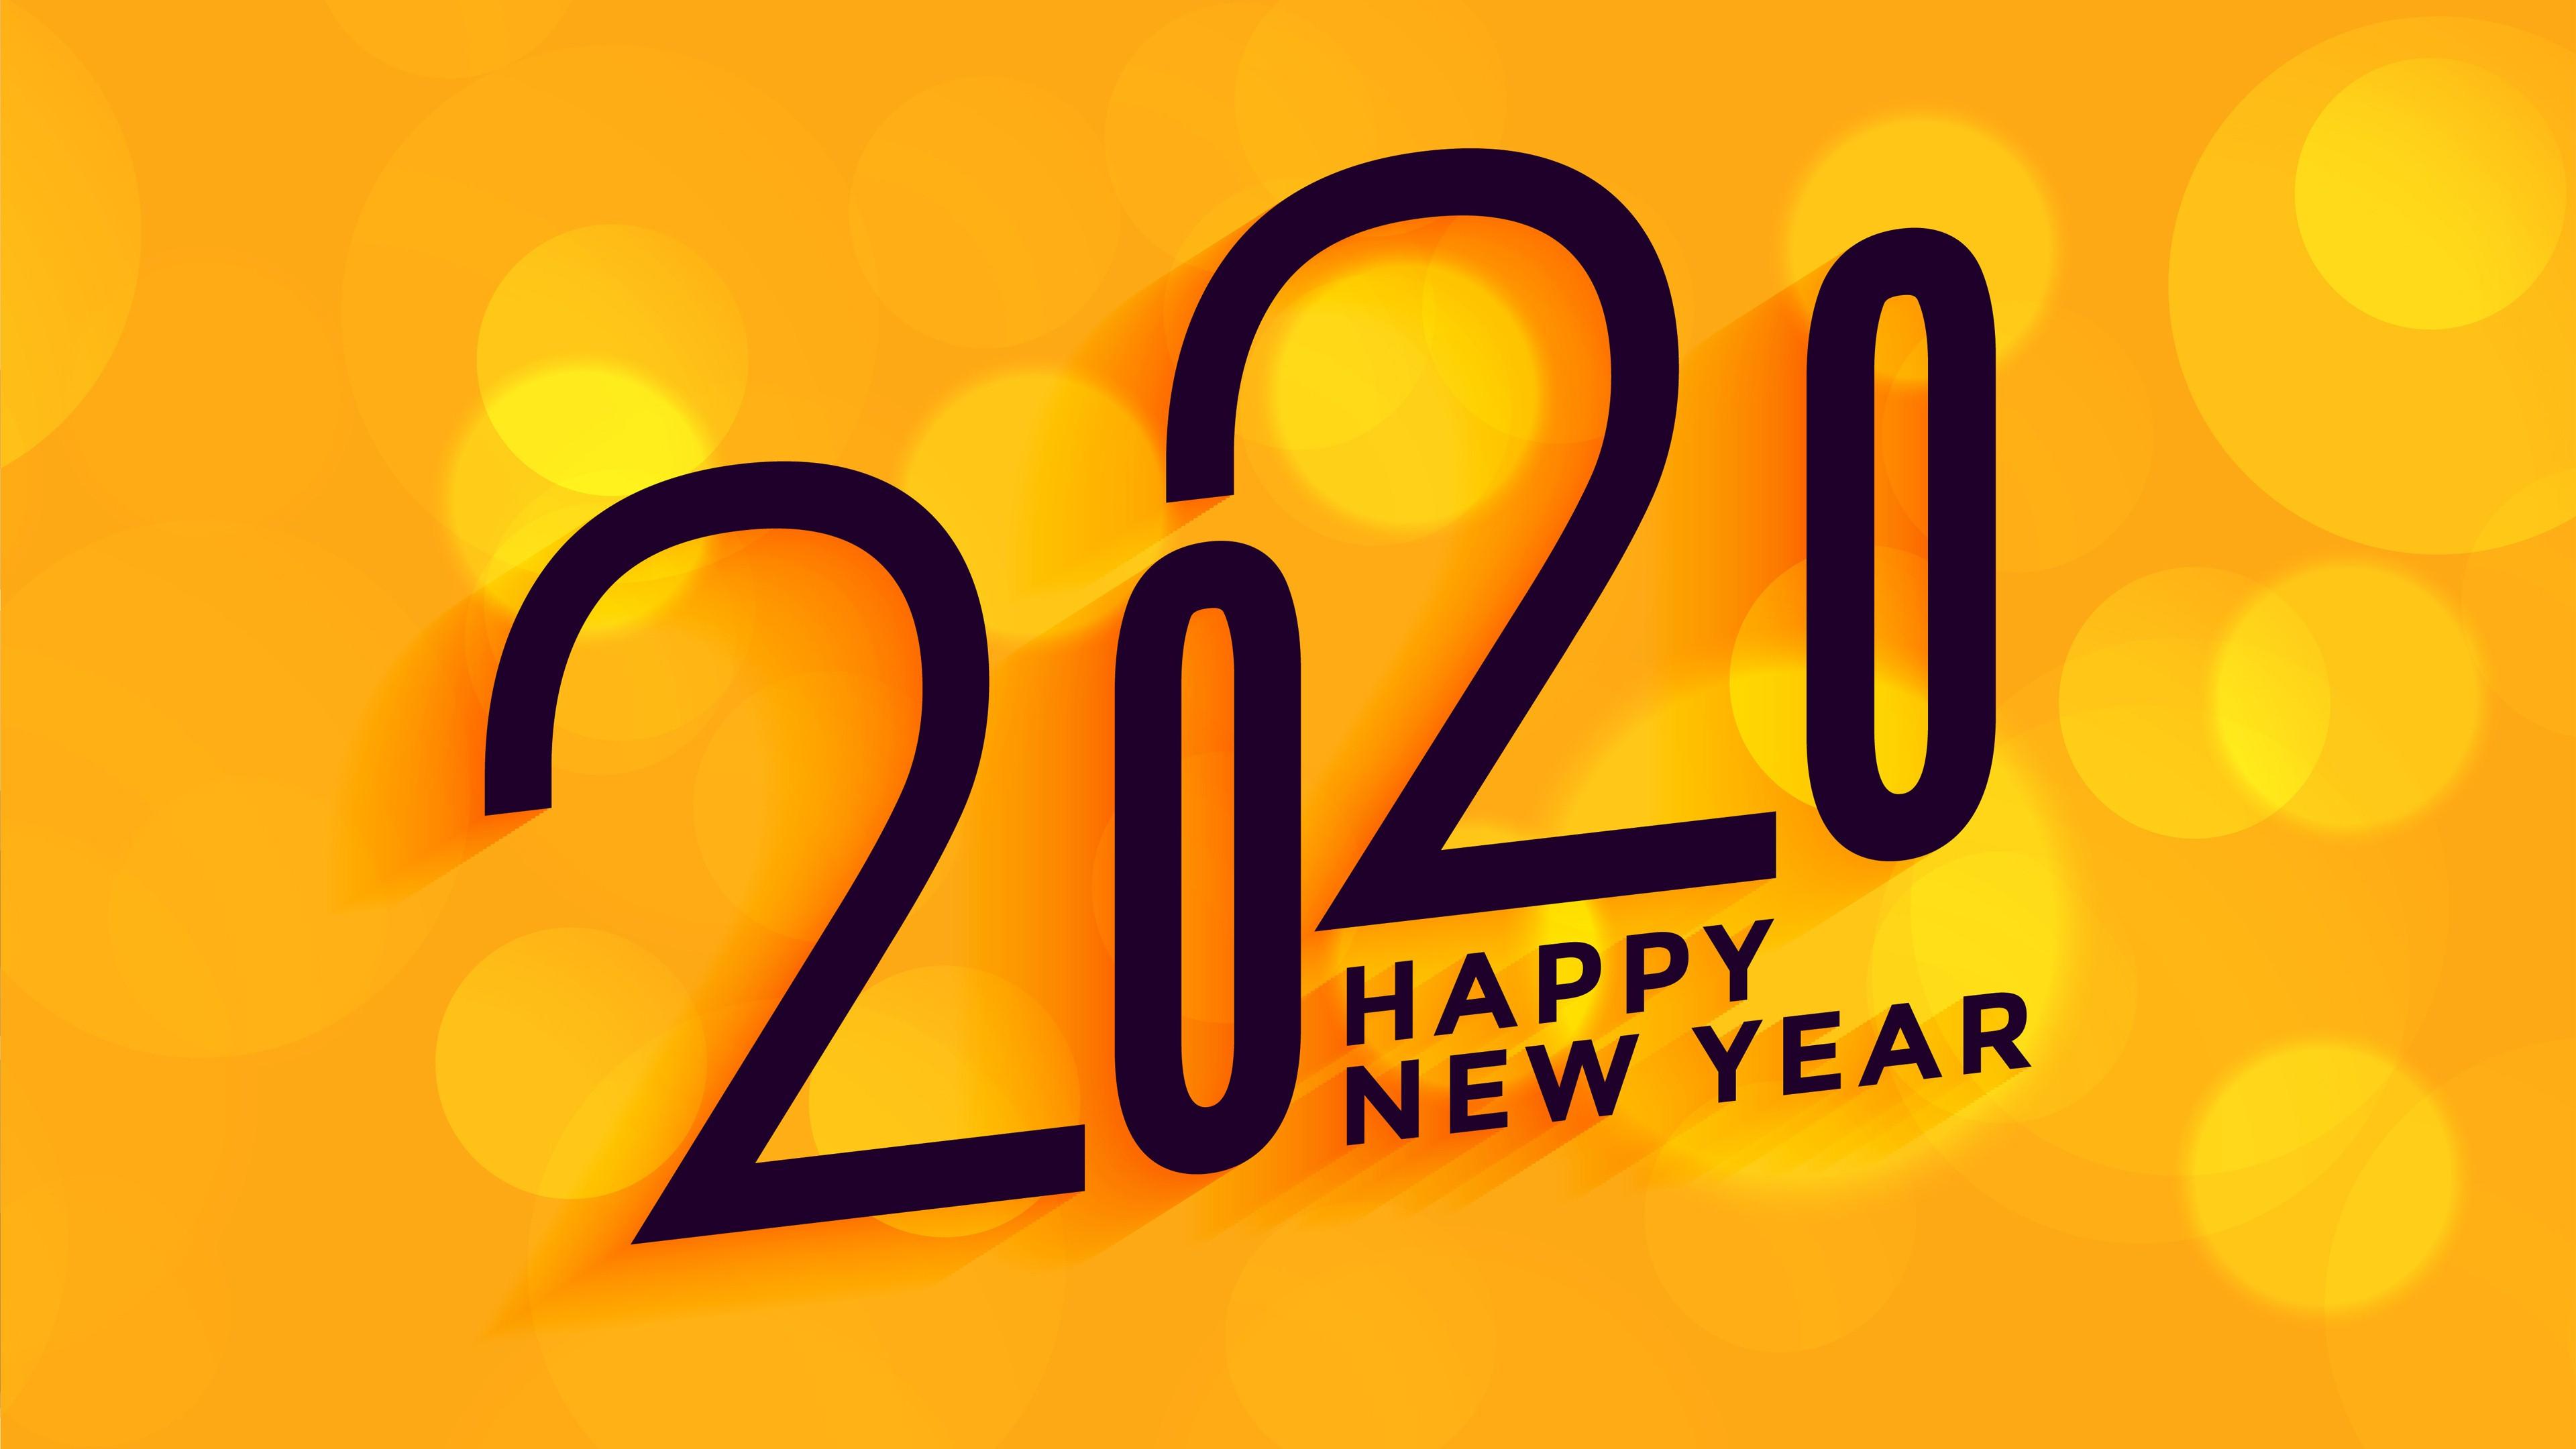 download 2020 Happy New Year Yellow 4K Wallpaper HD 3840x2160